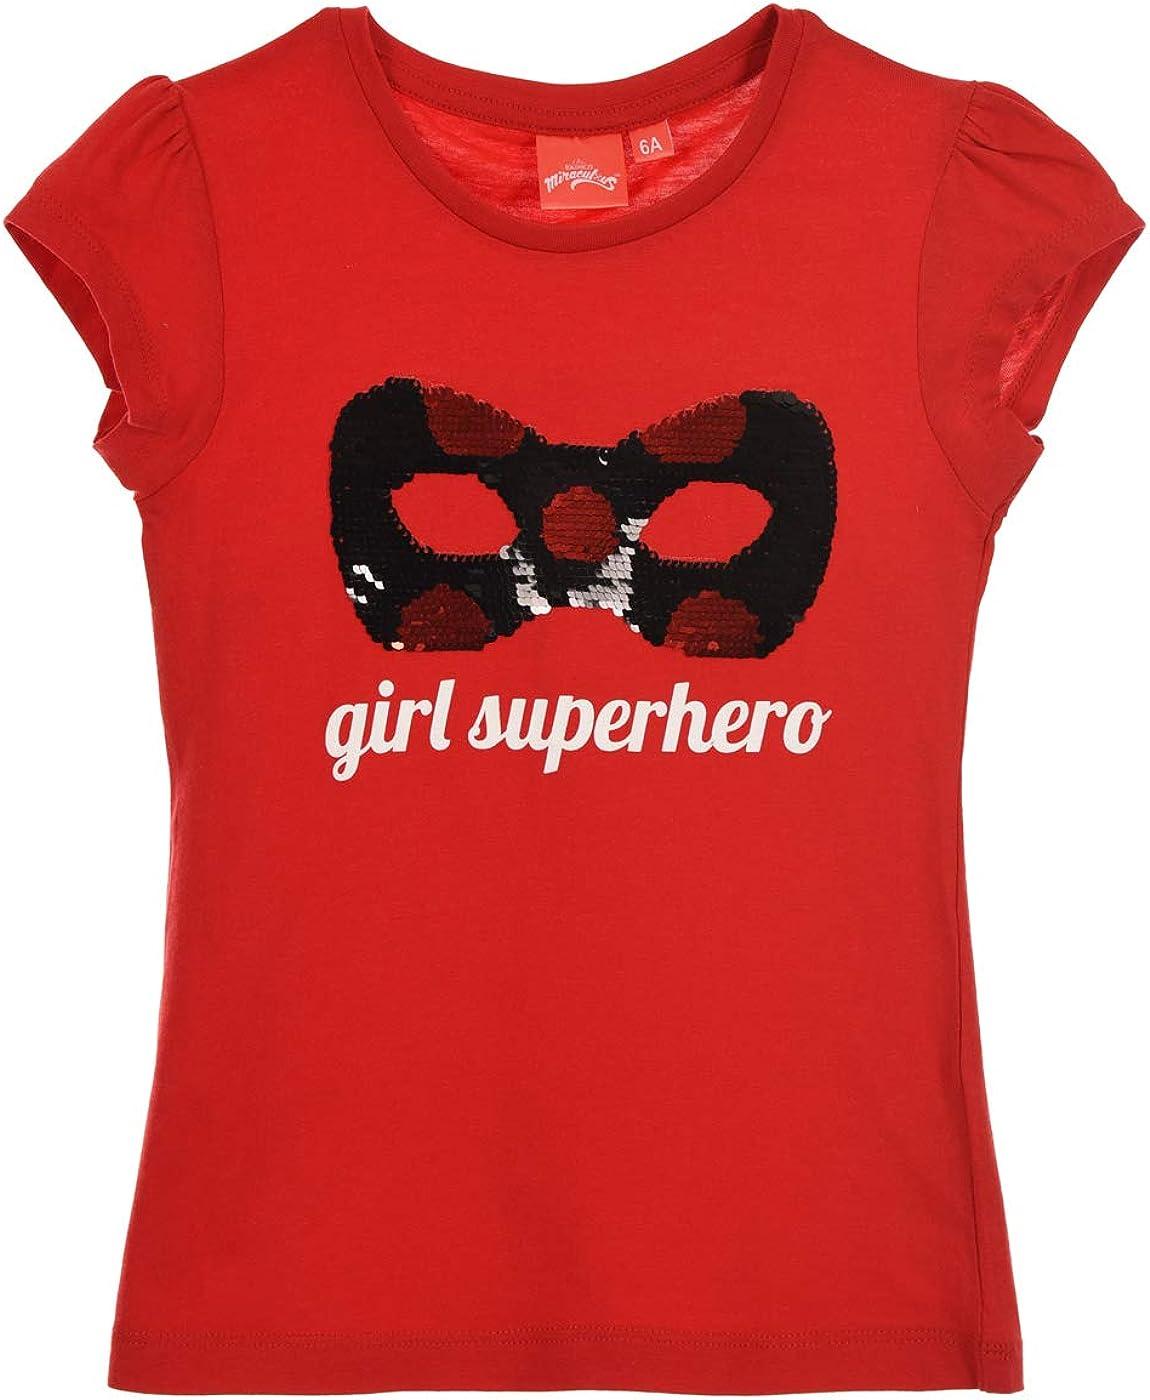 Miraculous Girls T Shirt